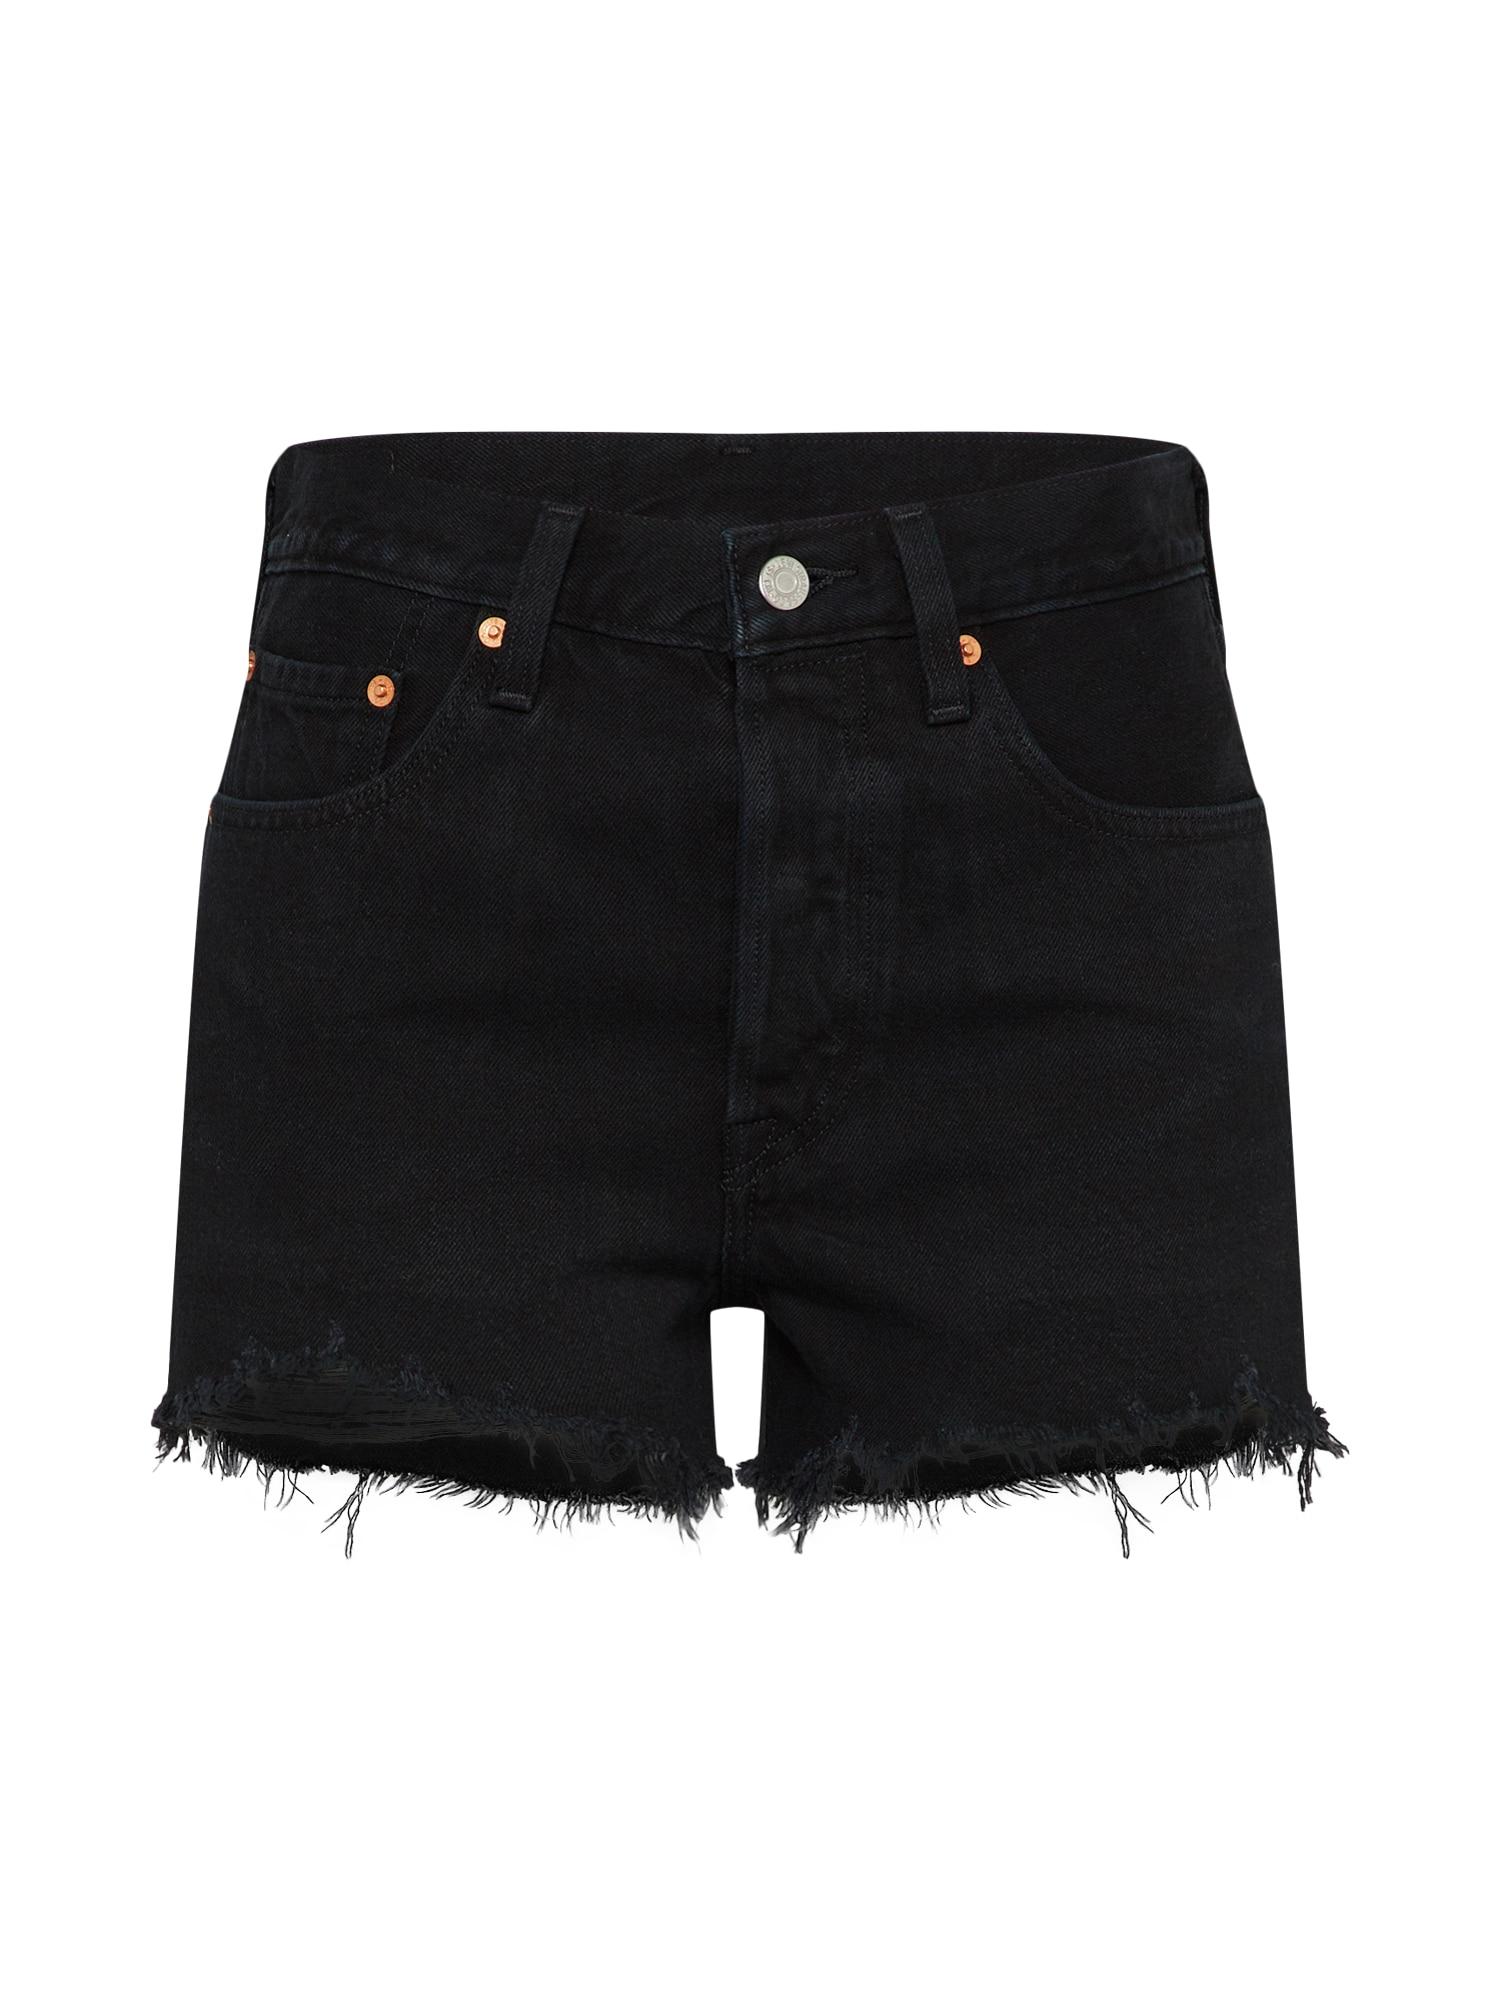 LEVI'S Dames Jeans 501® HIGH RISE zwart